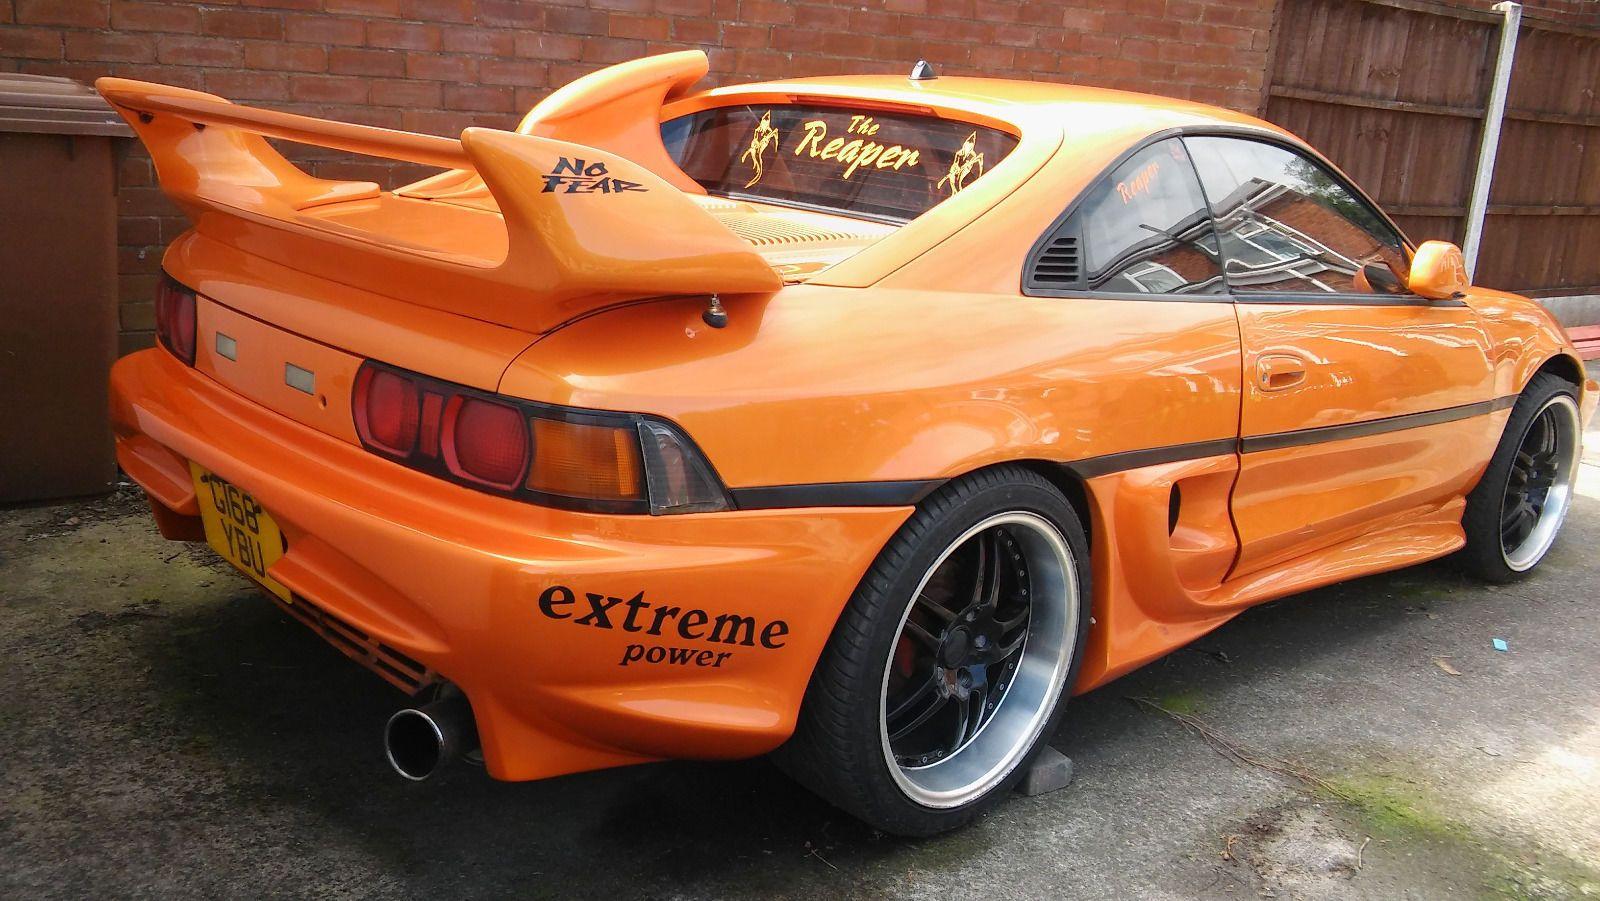 Toyota mr 2 turbo | Toyota, Vehicle and Cars